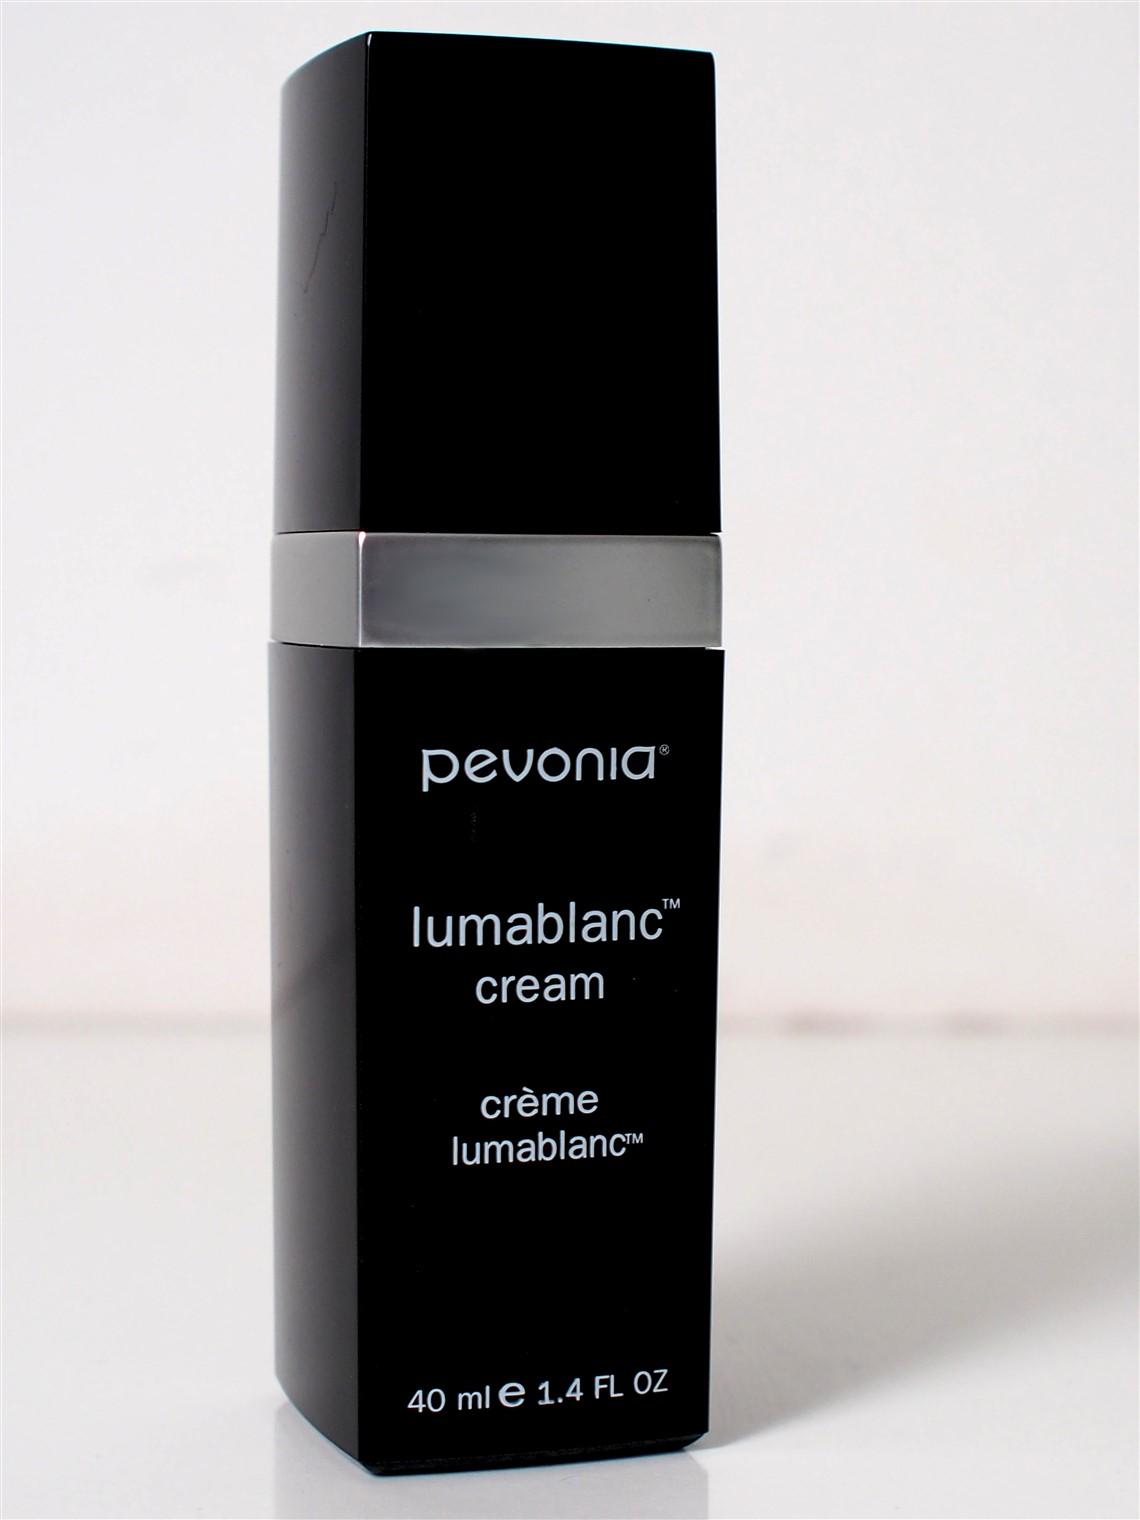 pevonia botanica lumabalanc cream